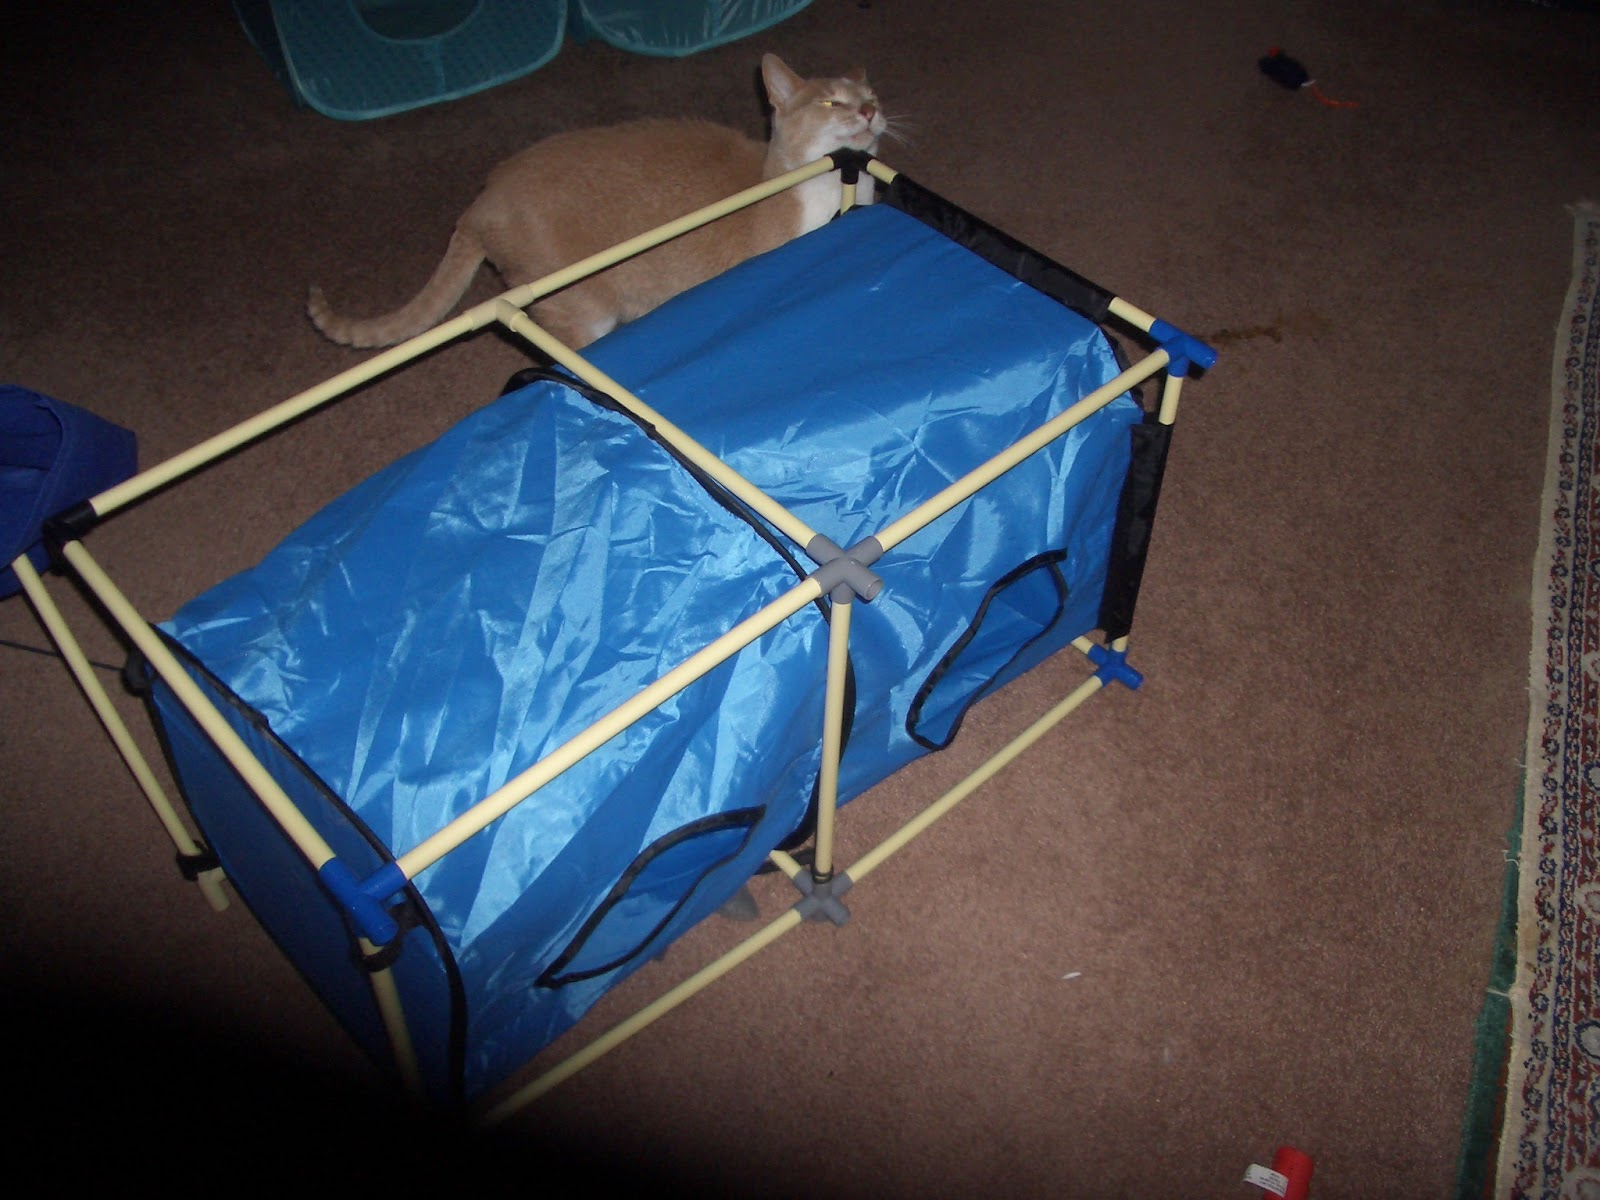 Vacuum Litter Boxes Zoe Bath Make Bed Laundry Organize